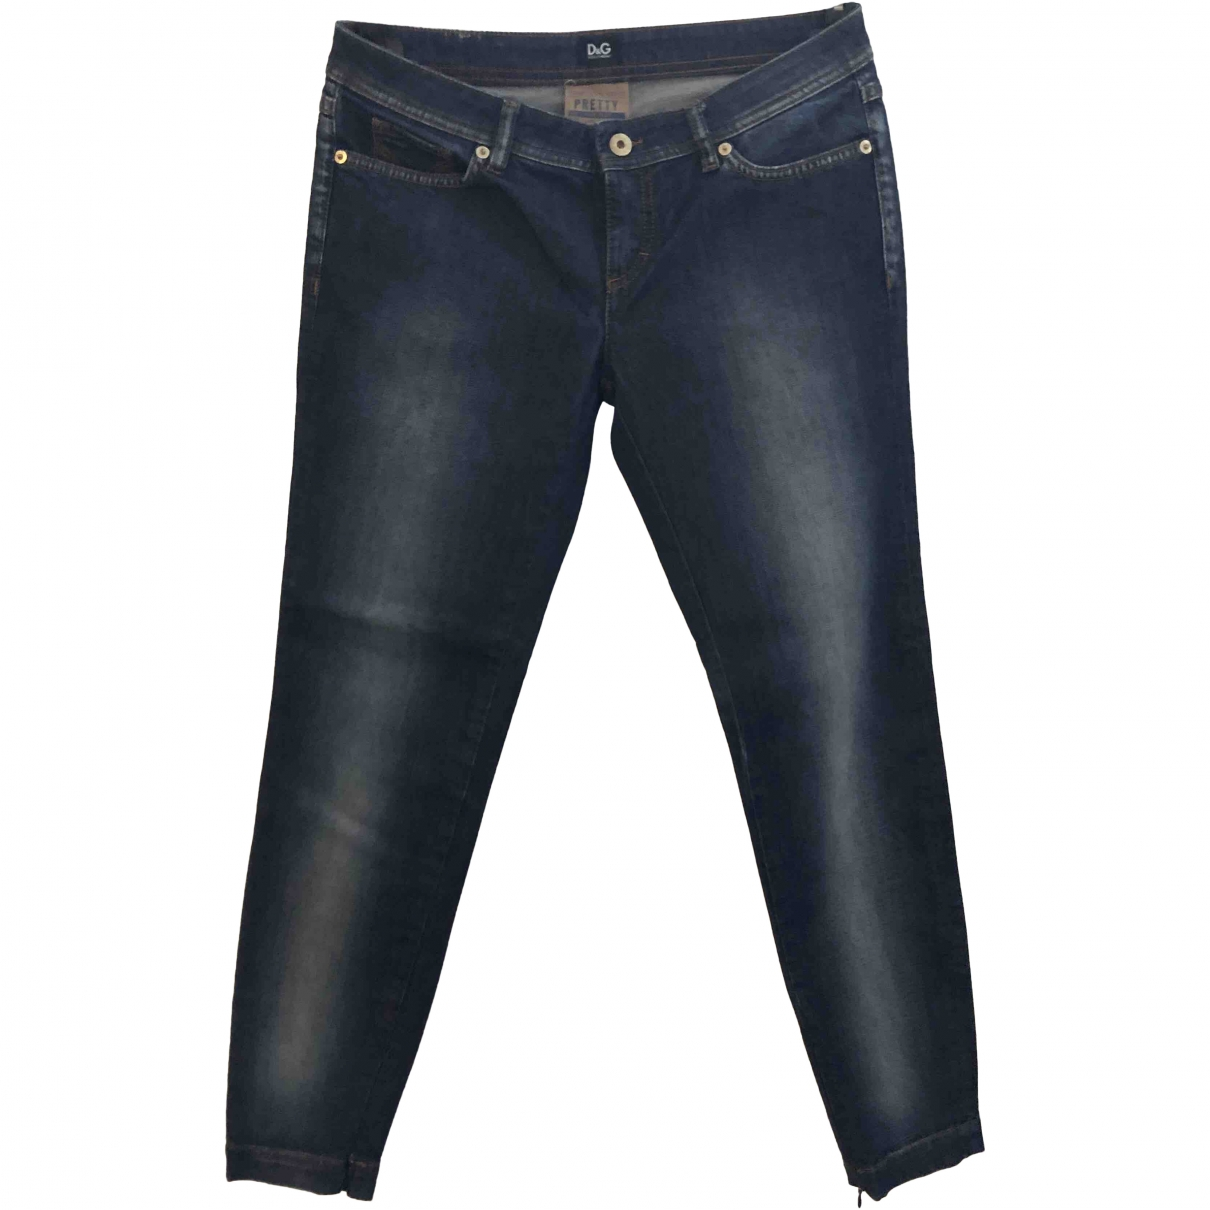 D&g \N Blue Denim - Jeans Jeans for Women 29 US